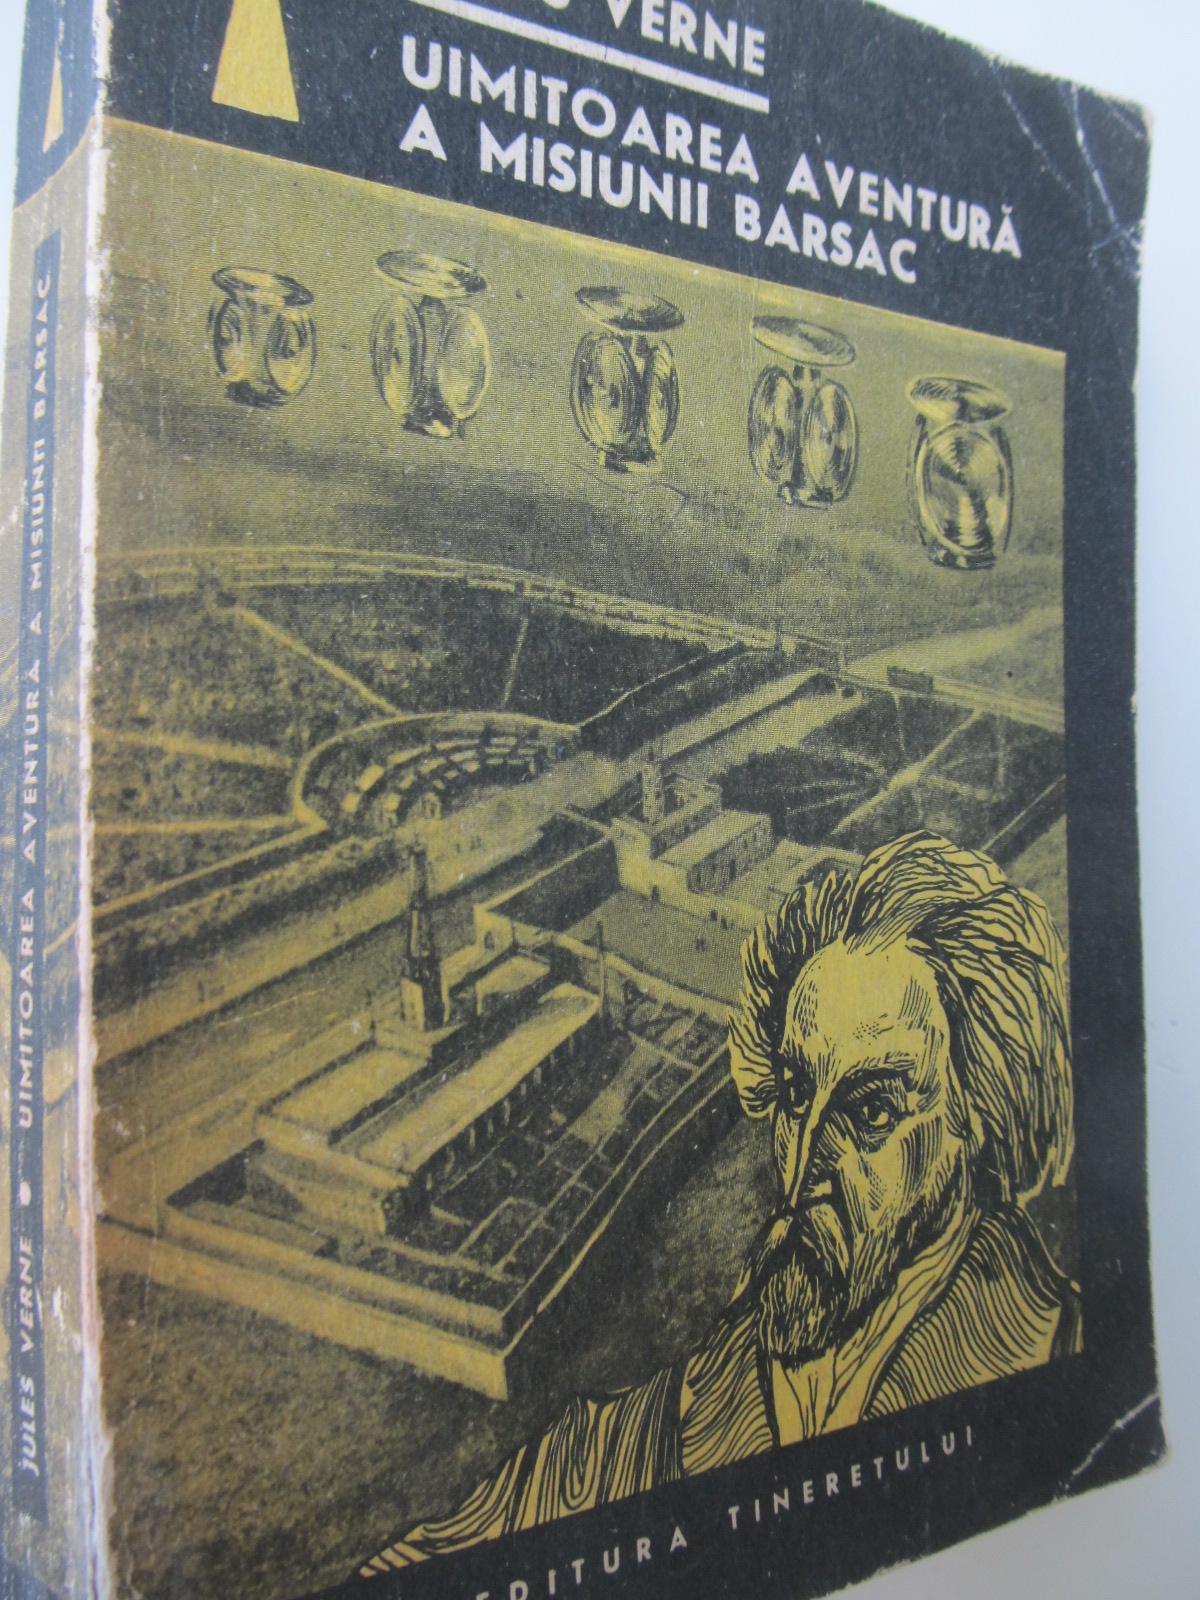 Uimitoarea aventura a misiunii Barsac - Jules Verne | Detalii carte